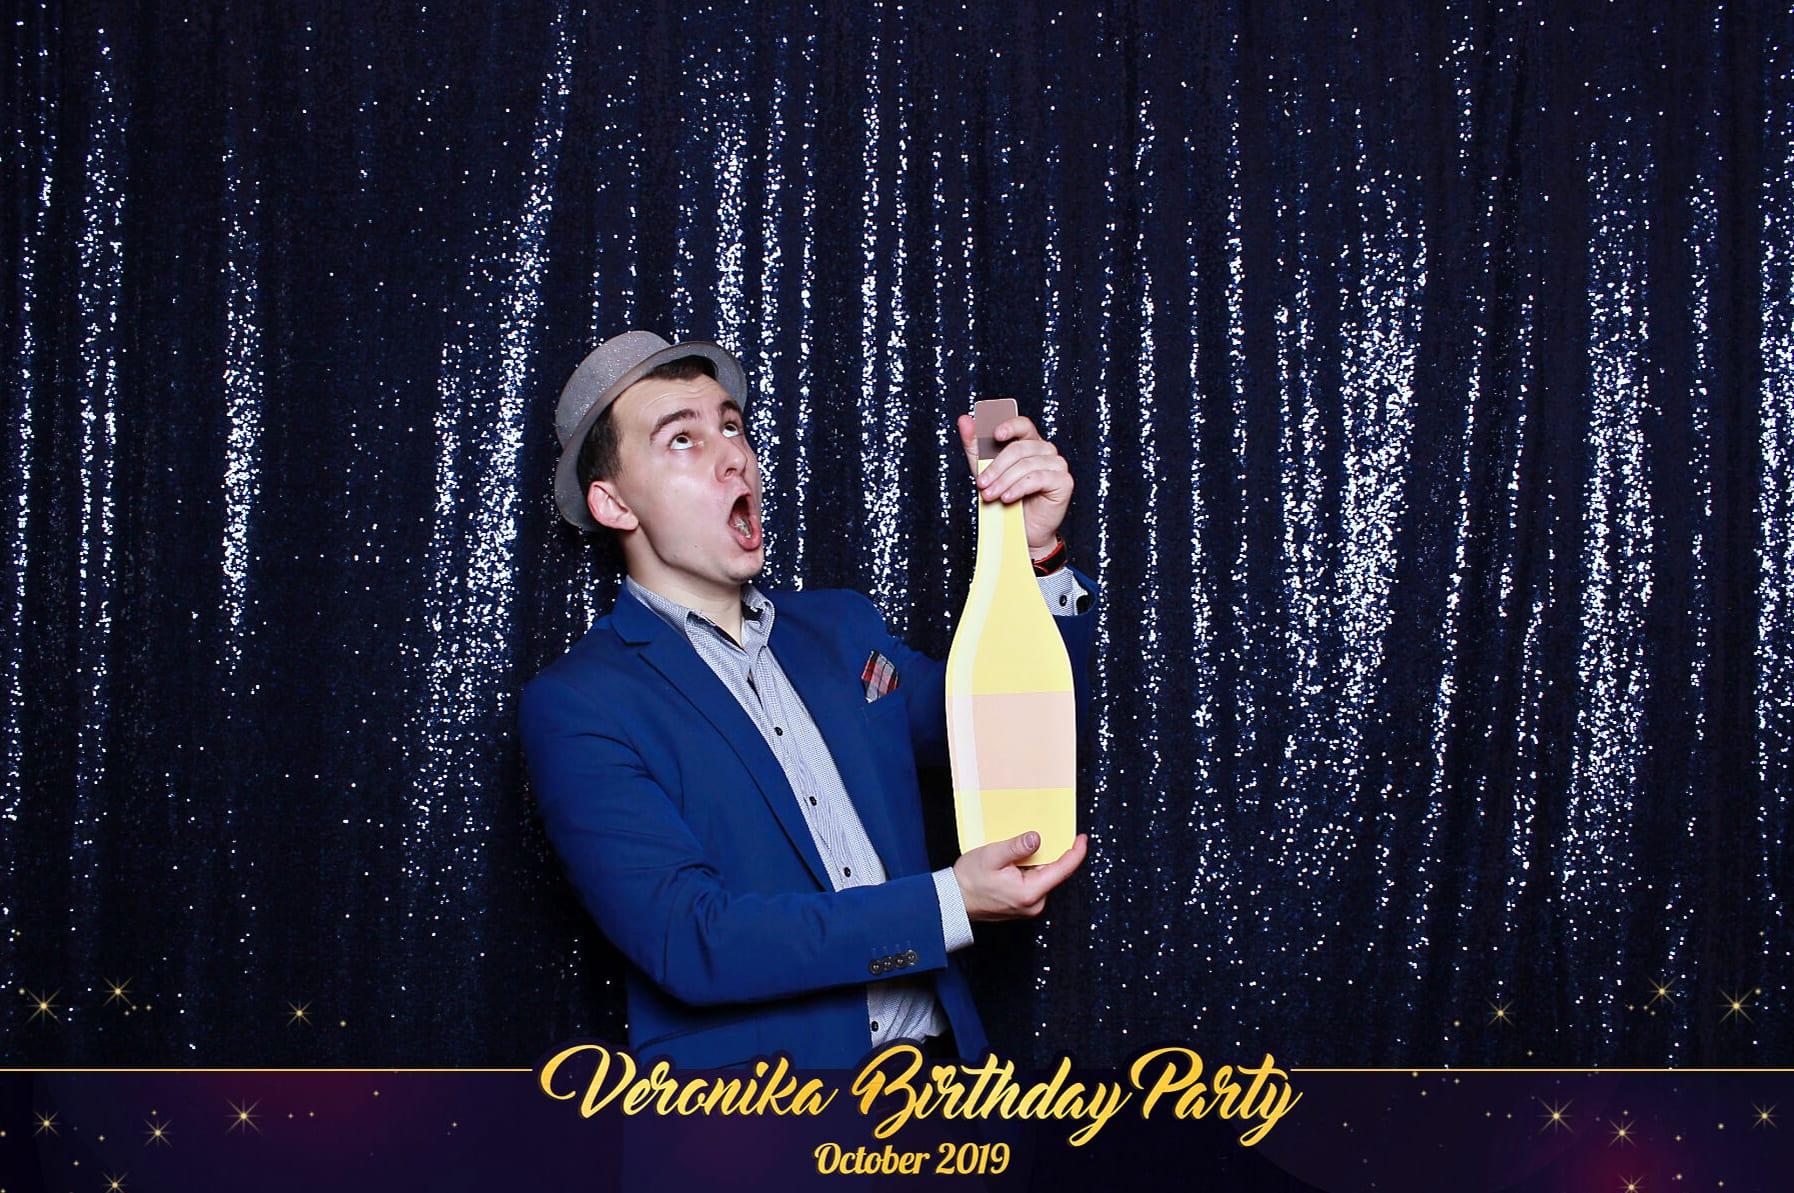 fotokoutek-oslava-praha-veronika-birthday-party-26-10-2019-665103